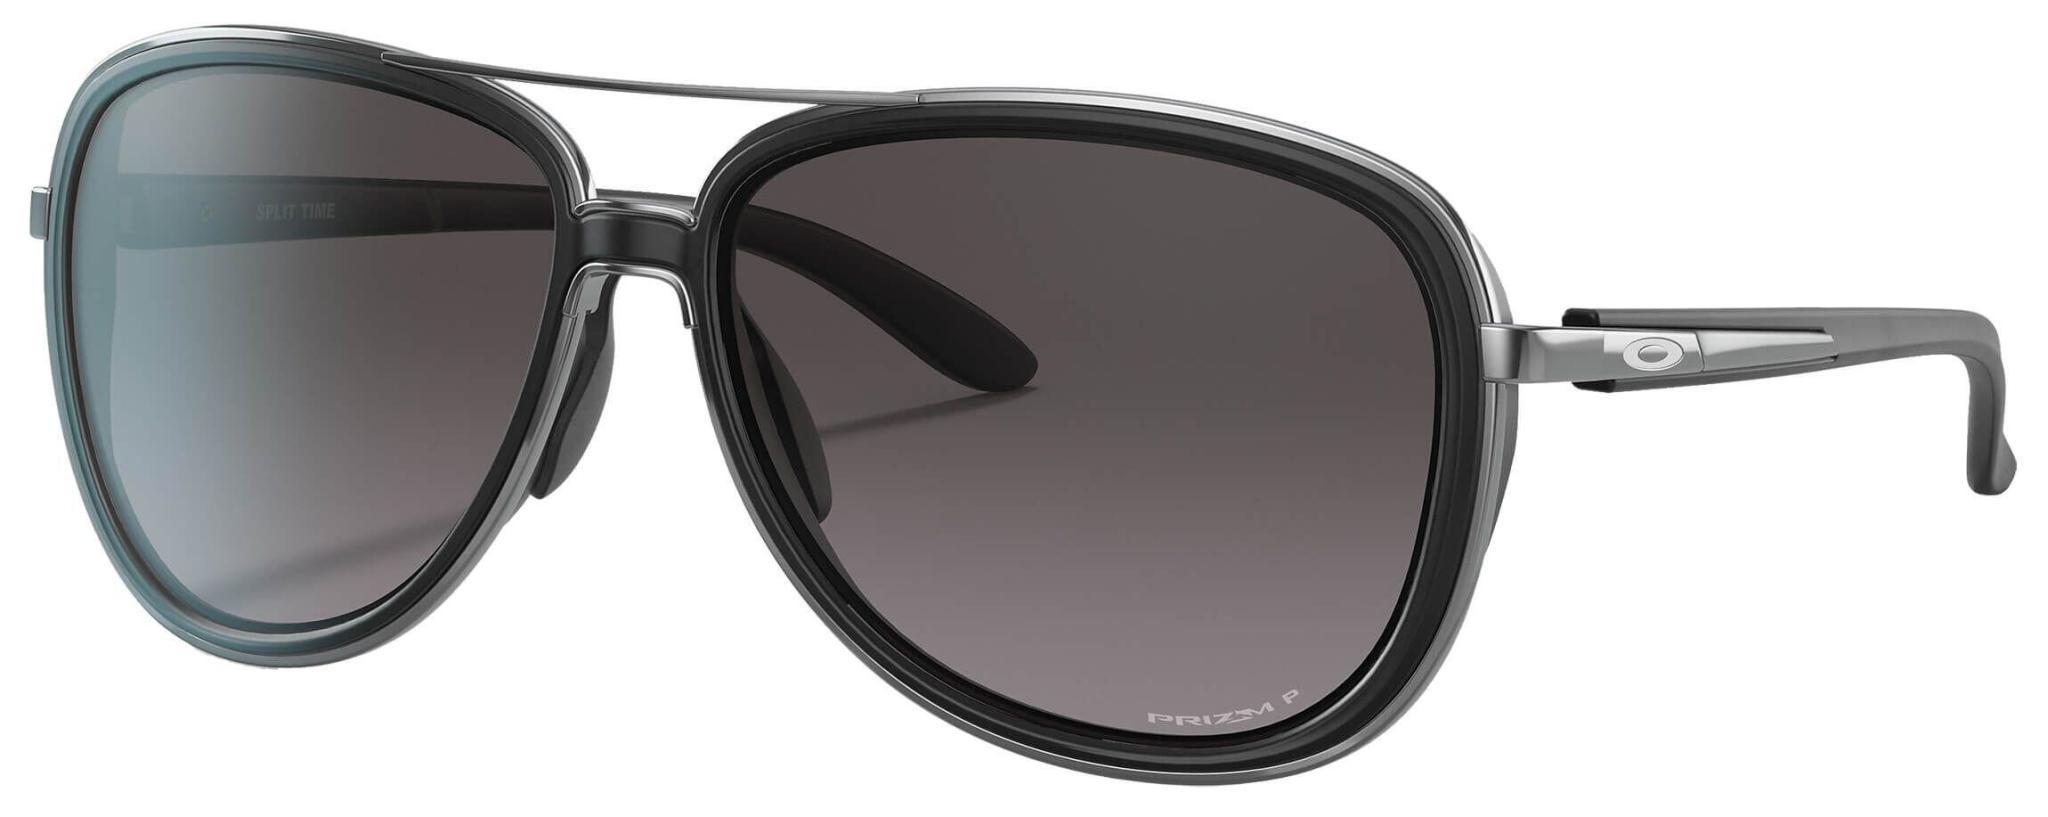 Oakley Oakley Split Time Velvet Black w/ Prizm Grey Gradient Sunglasses